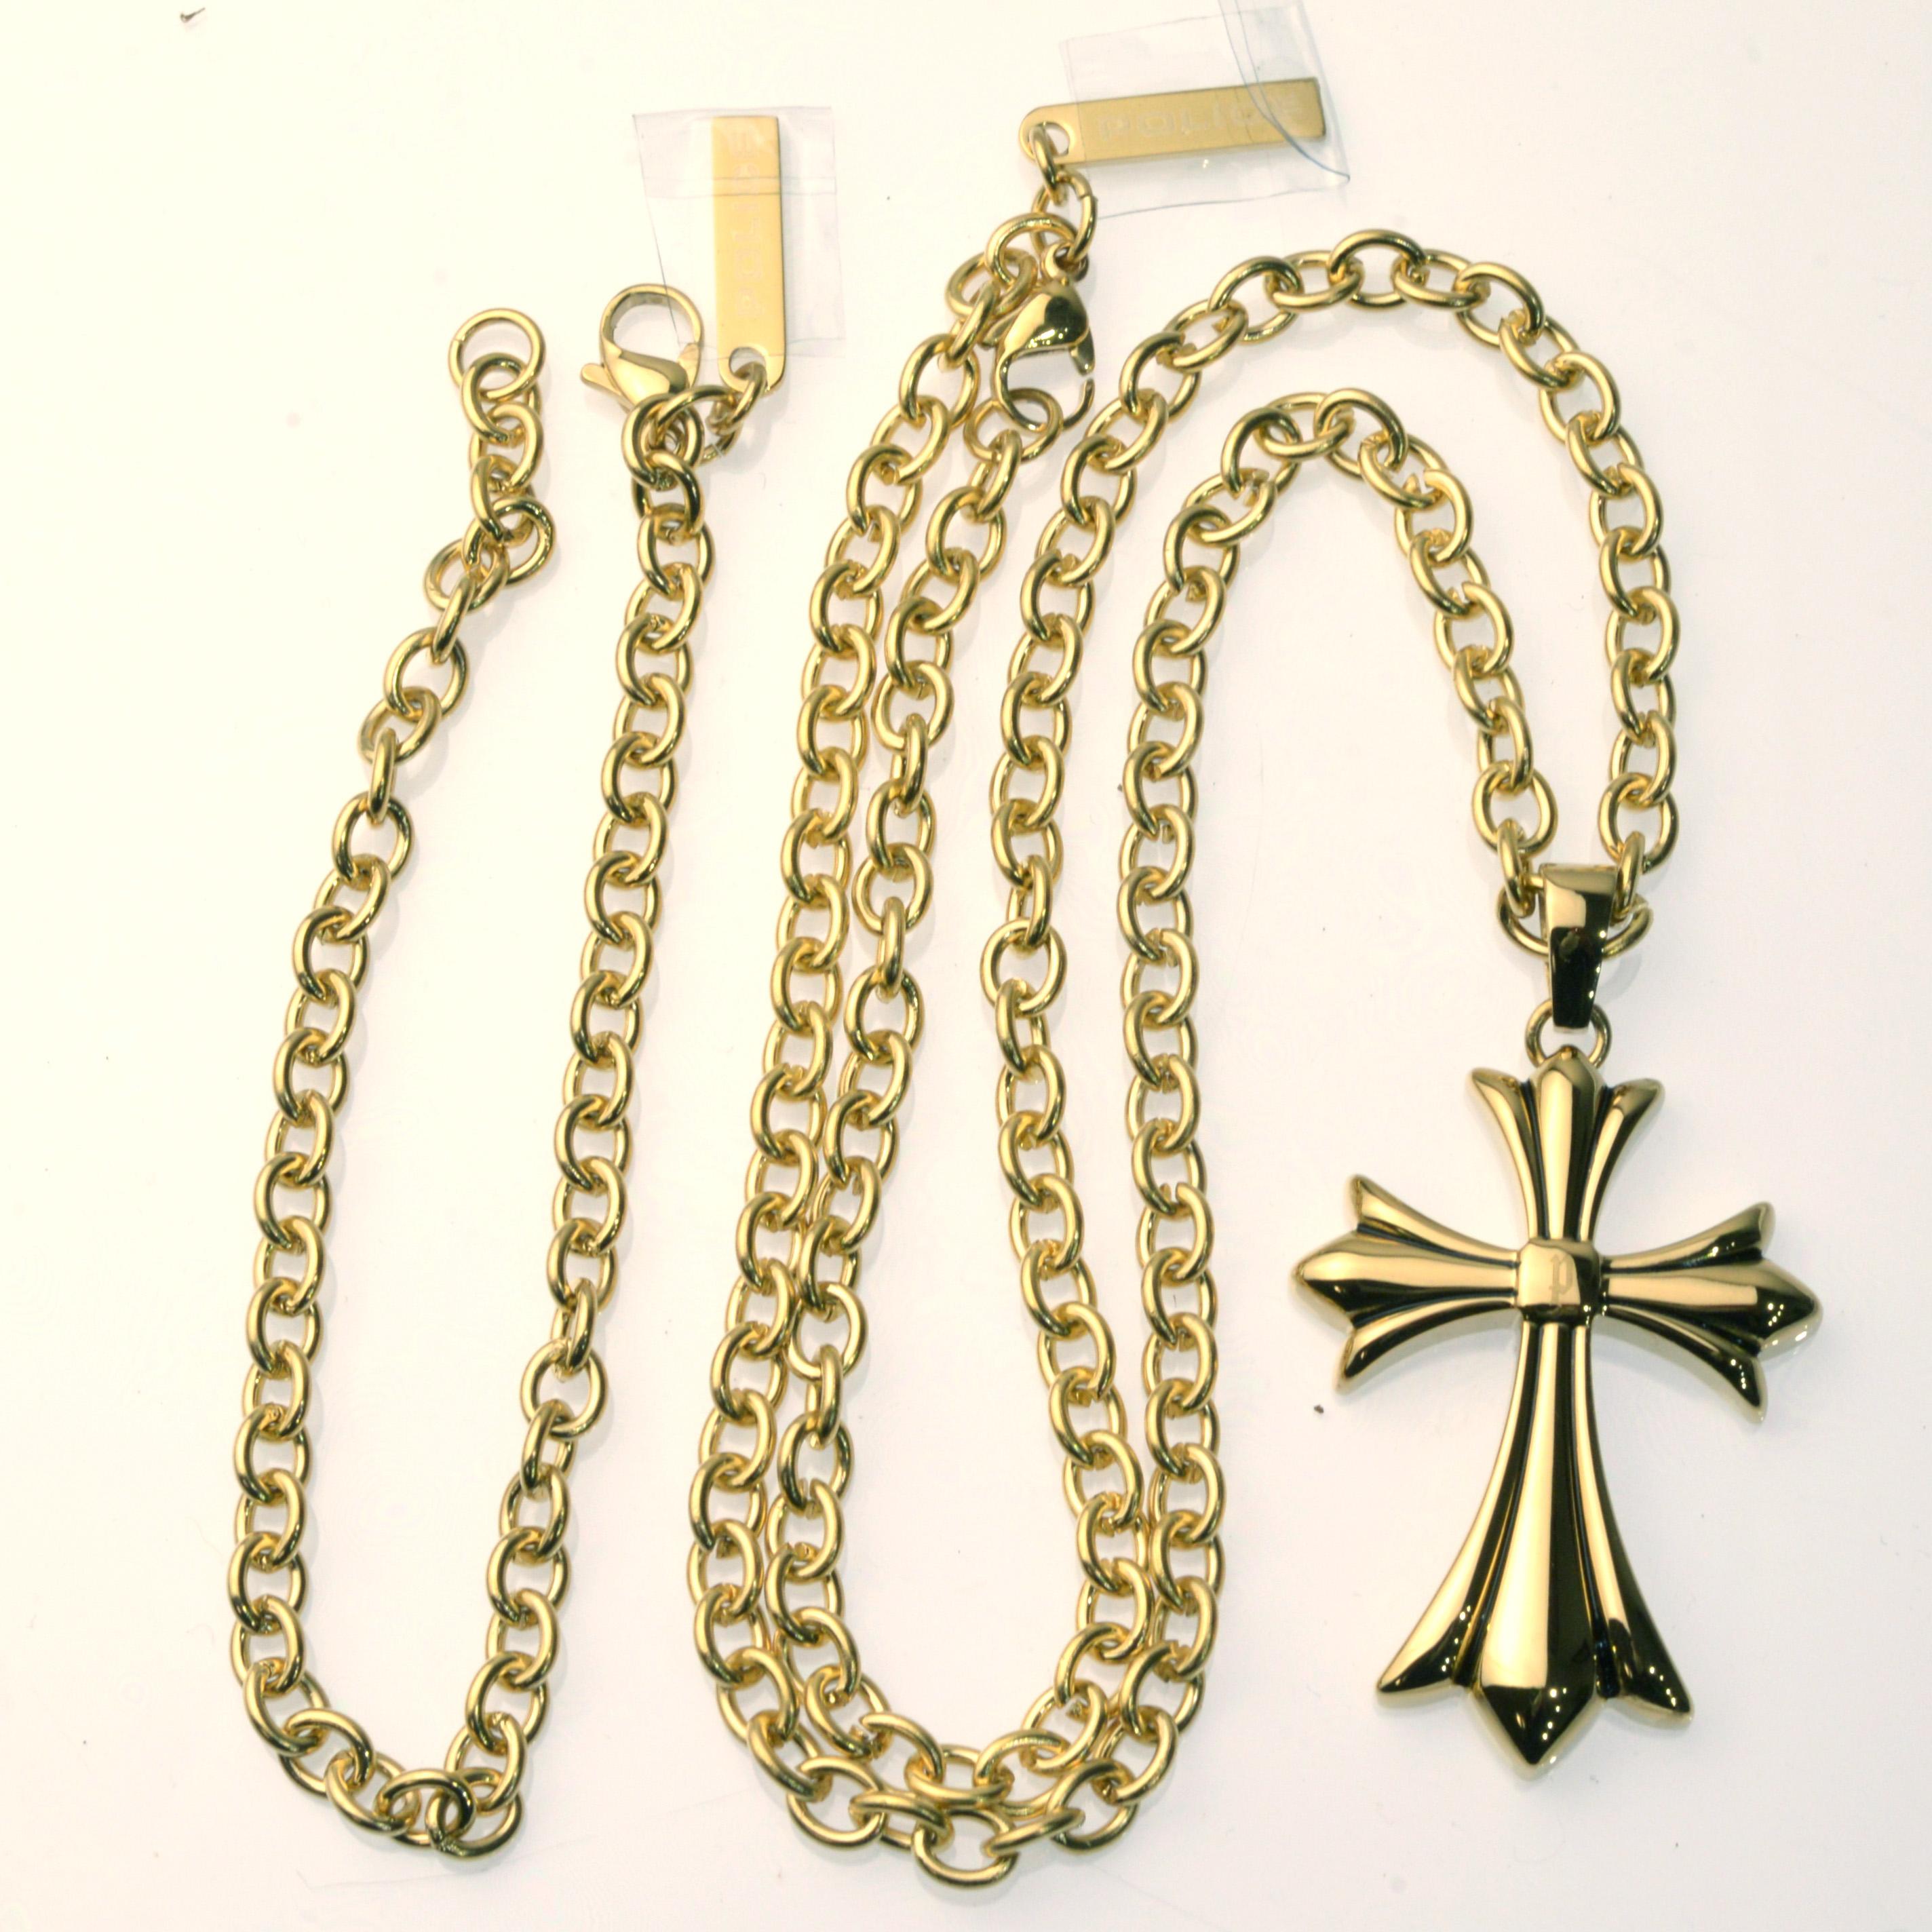 http://www.police.ne.jp/images/Police_necklace_grace_gold-03.jpg